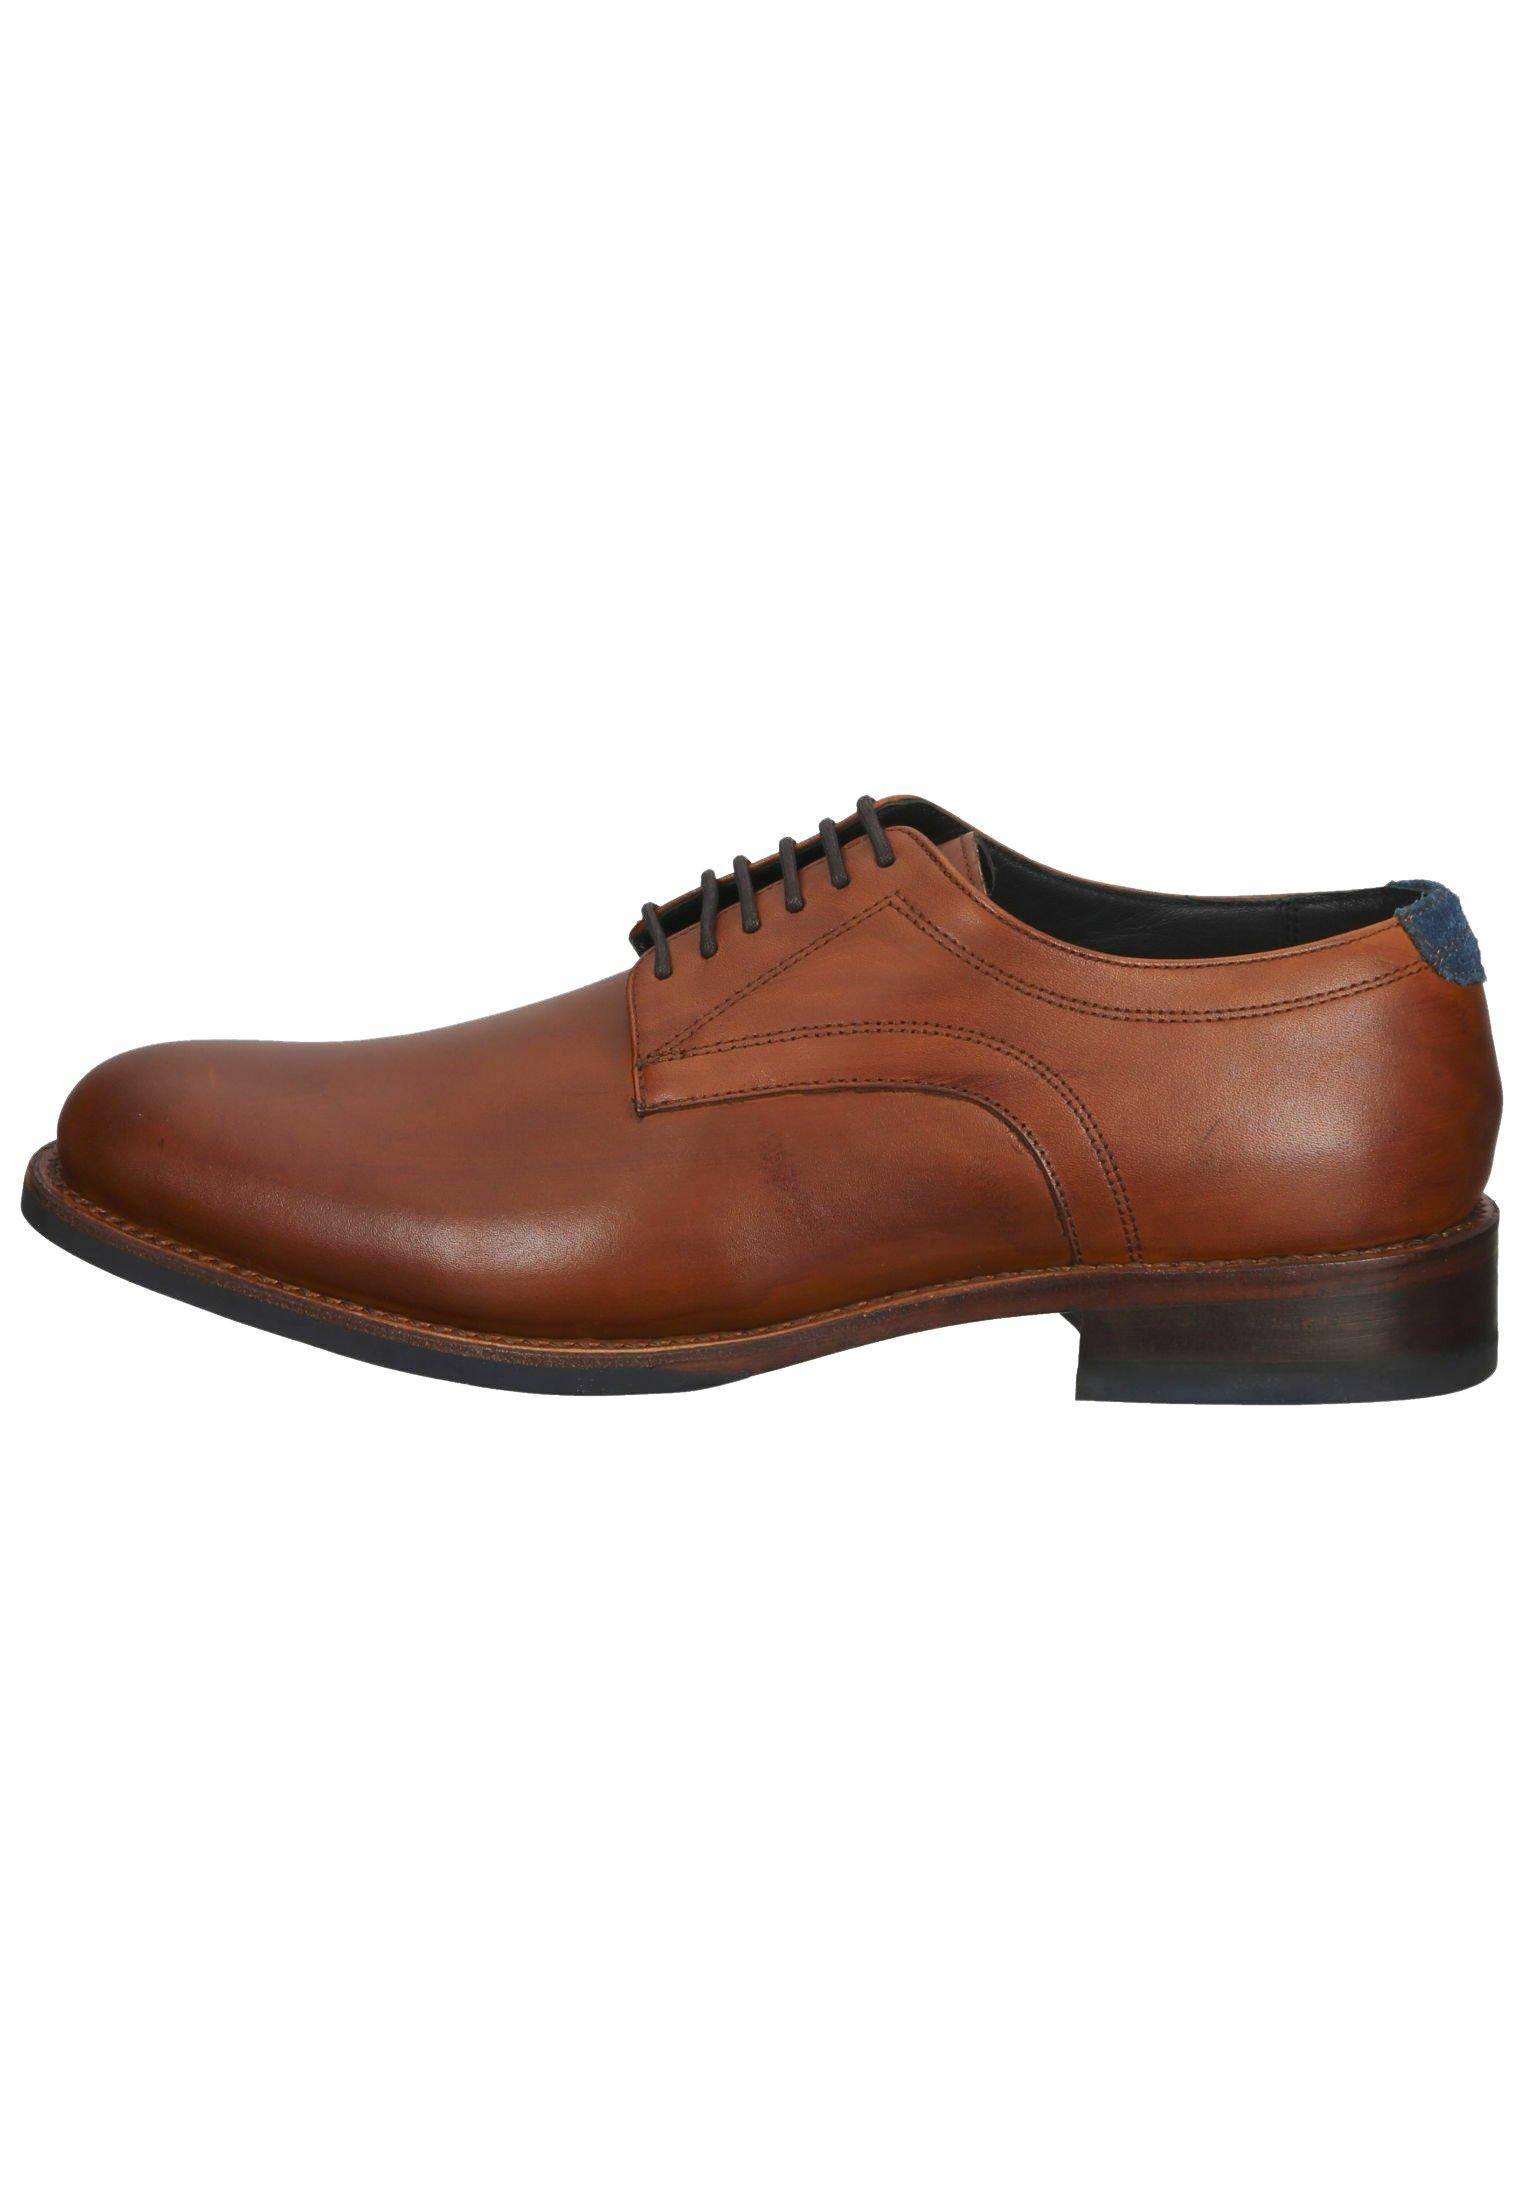 Herrer Business sko